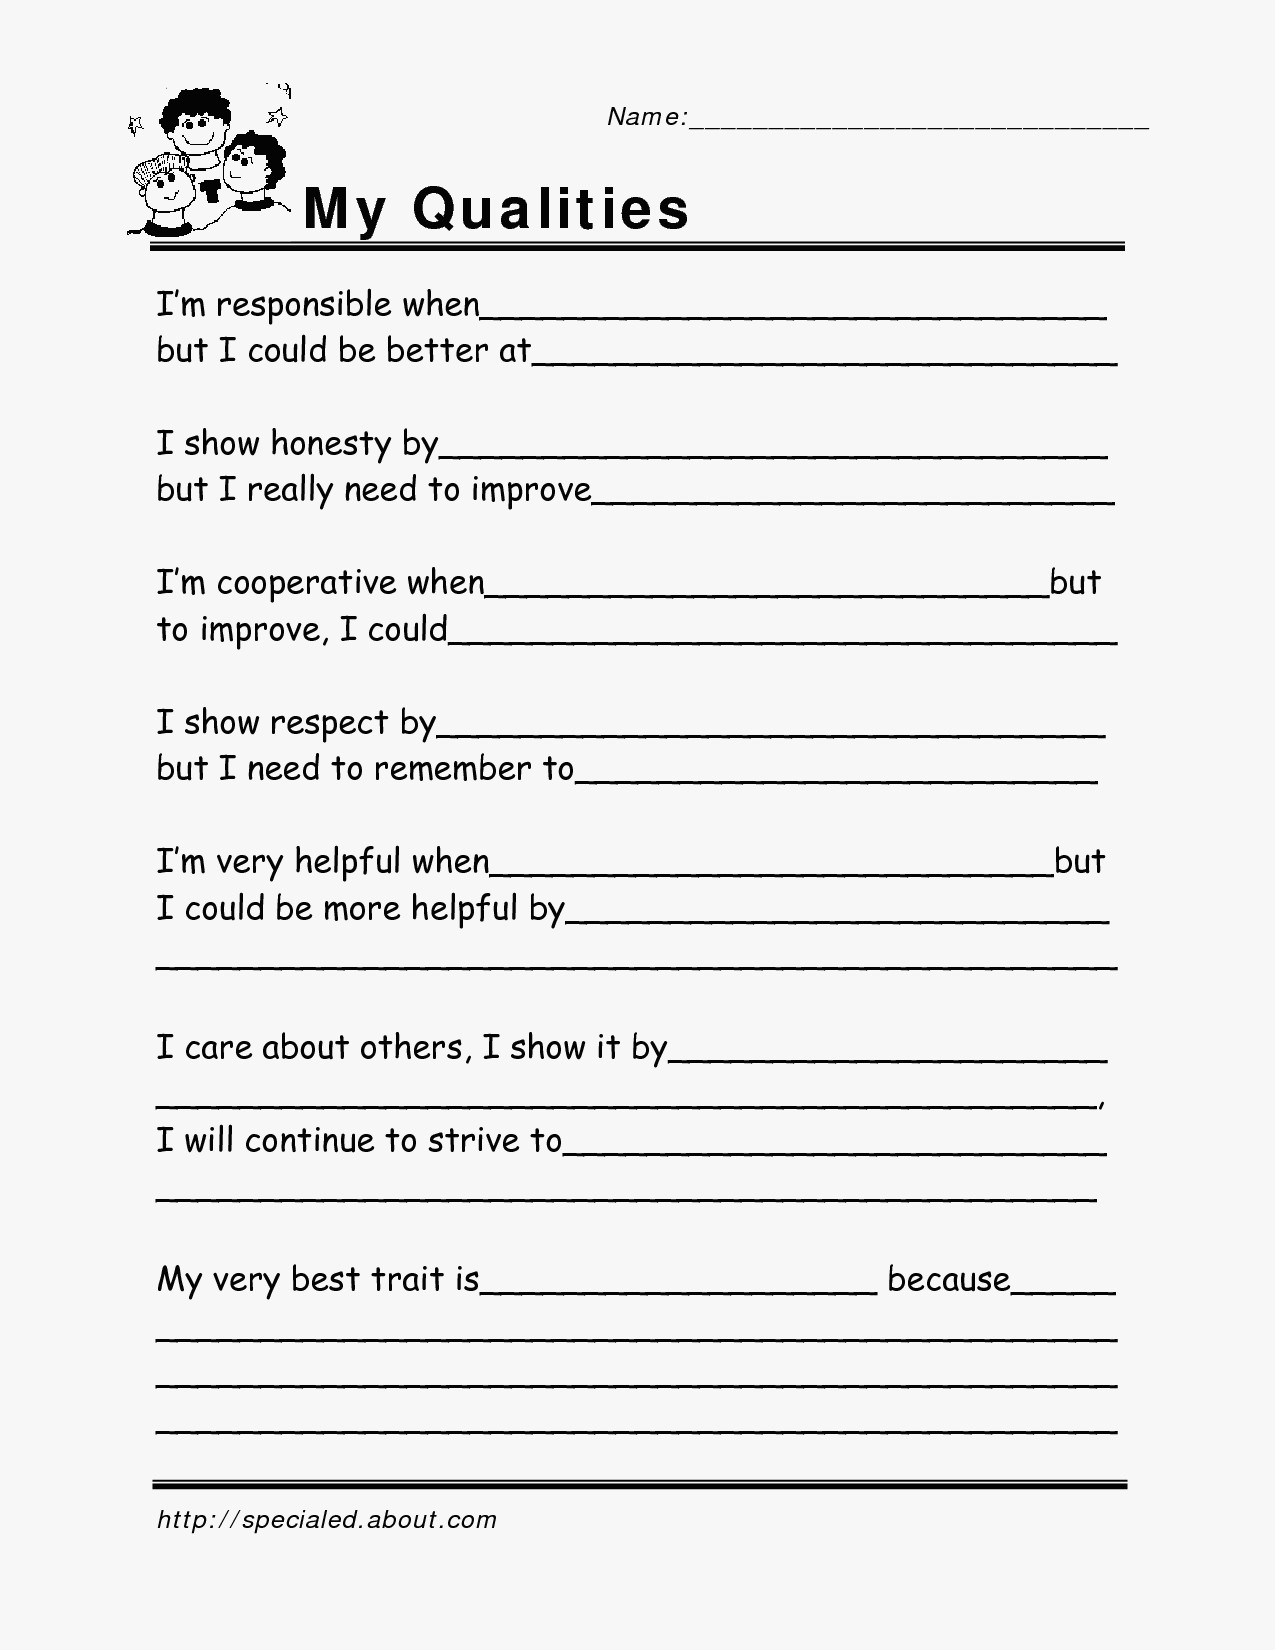 60 Elegant Of Latest Social Skills Worksheets For Adults